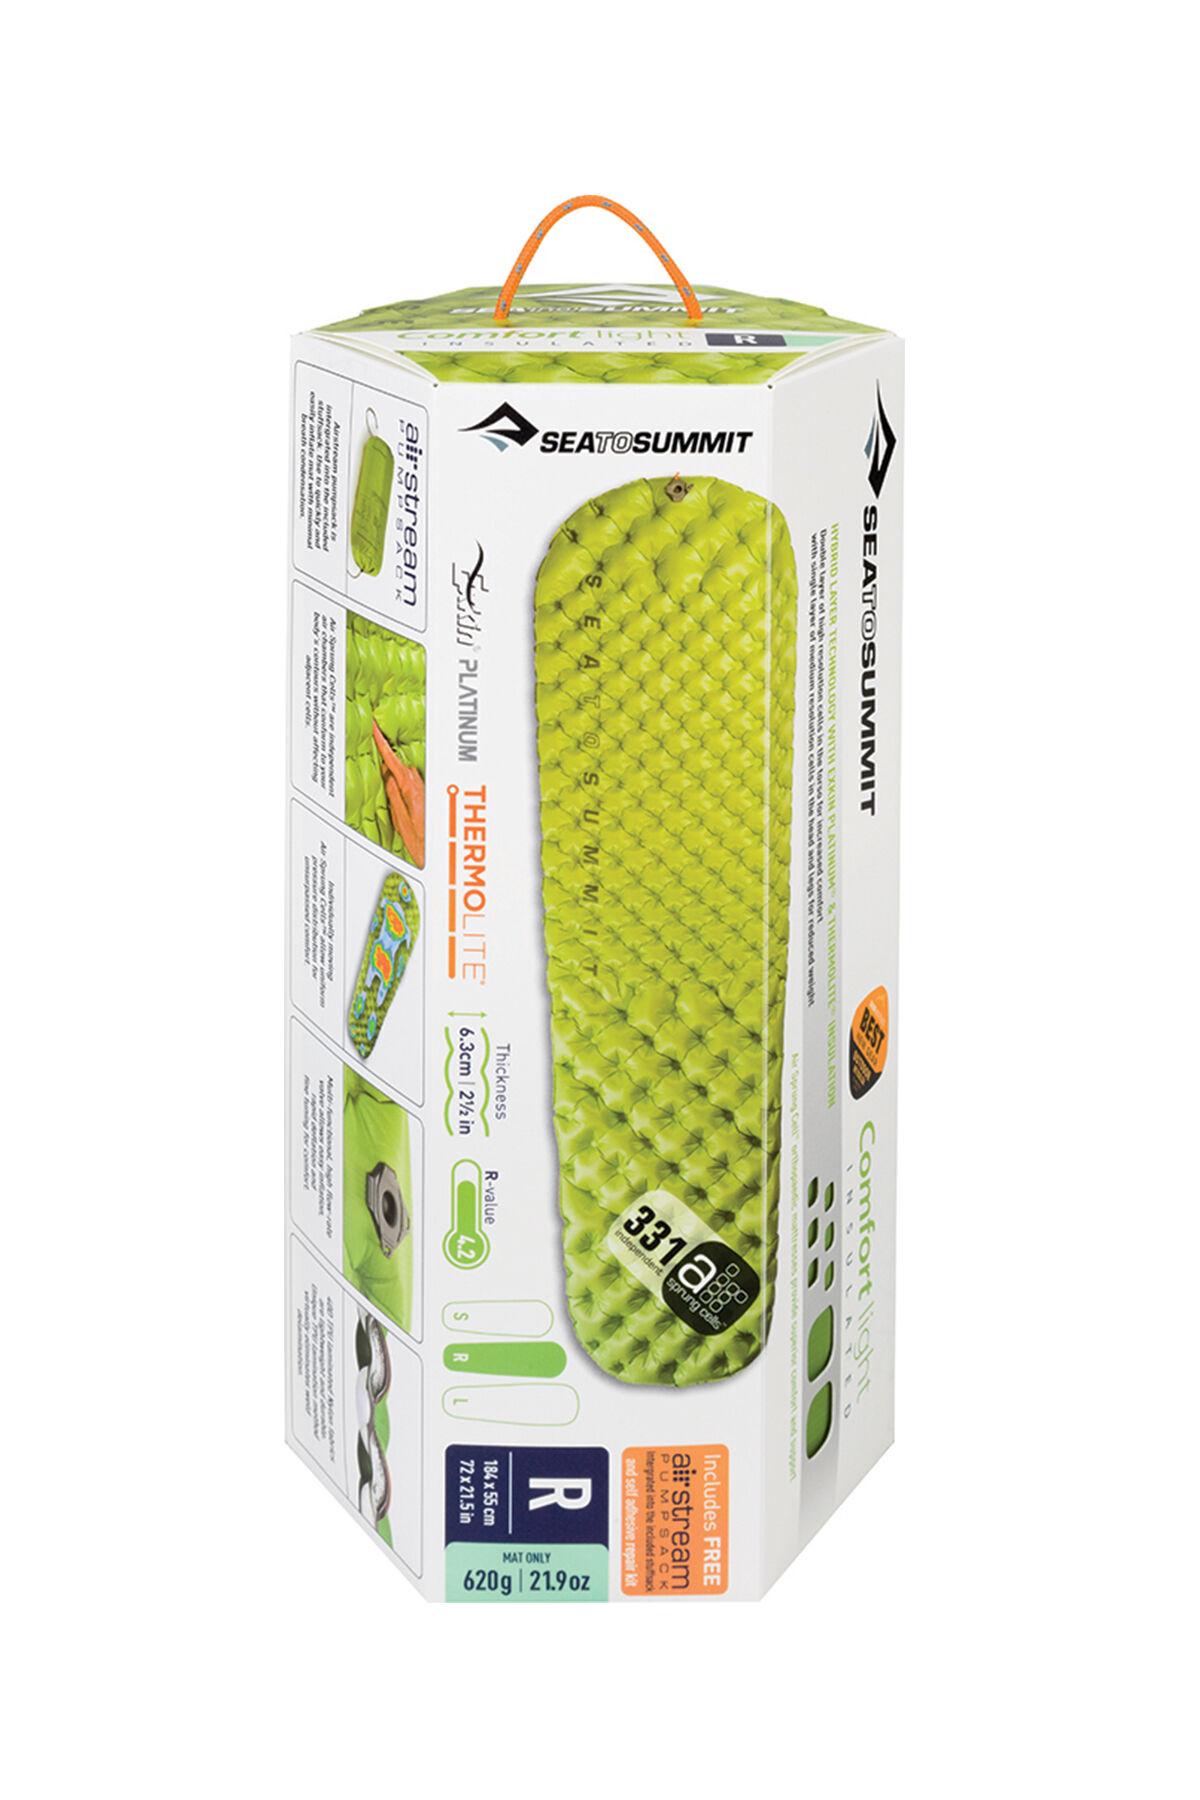 REGULAR AIR SPRUNG Outdoor Camping Sleeping Bed Comfort Light Insulating Mat